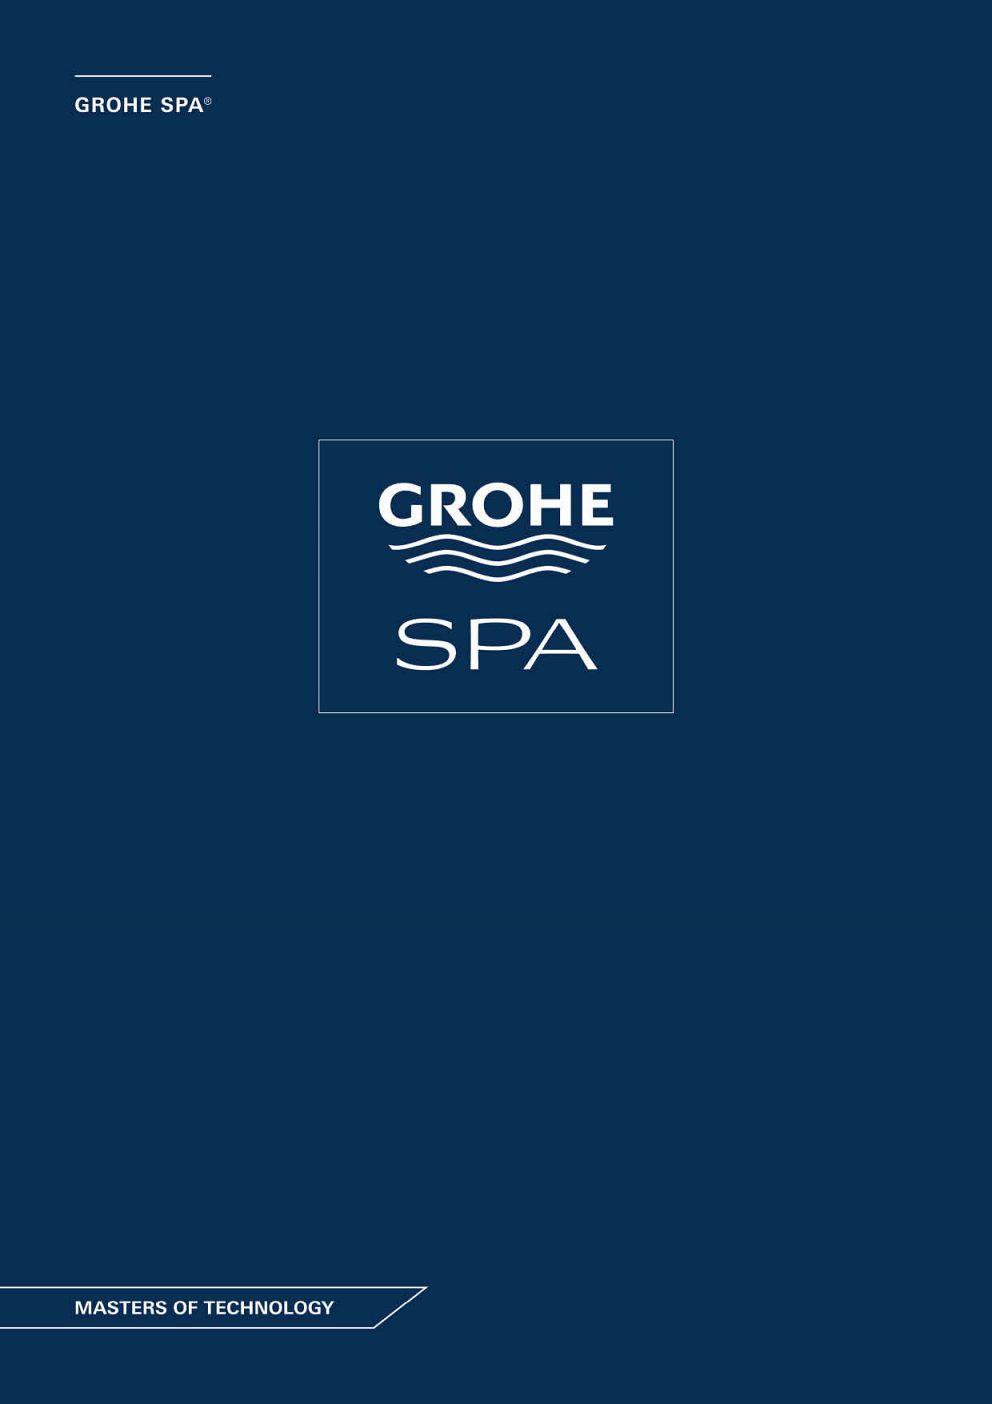 Grohe - SPA